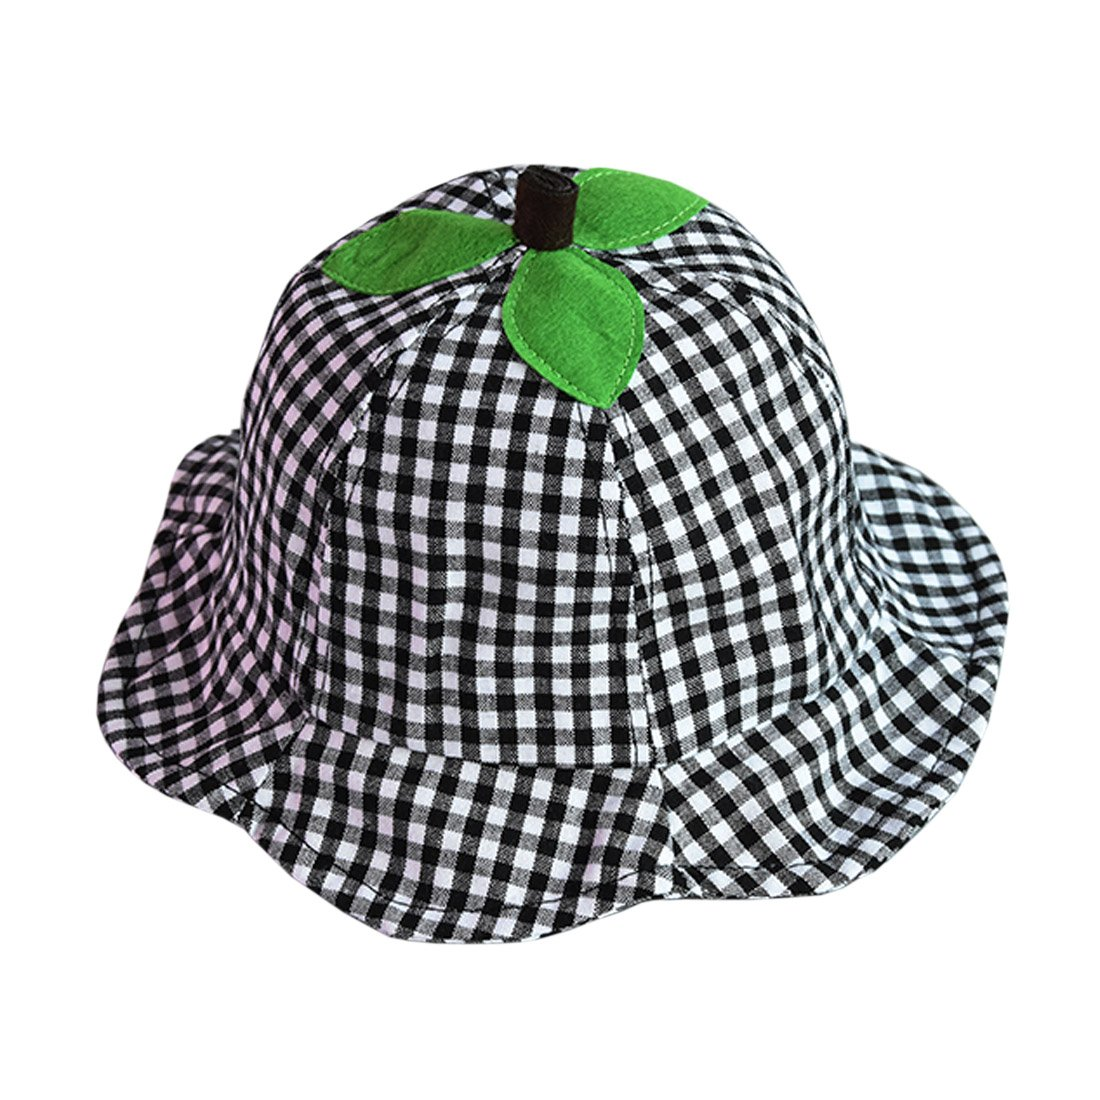 ACVIP Baby Toddler Girls Checkered Bucket Sun Hat